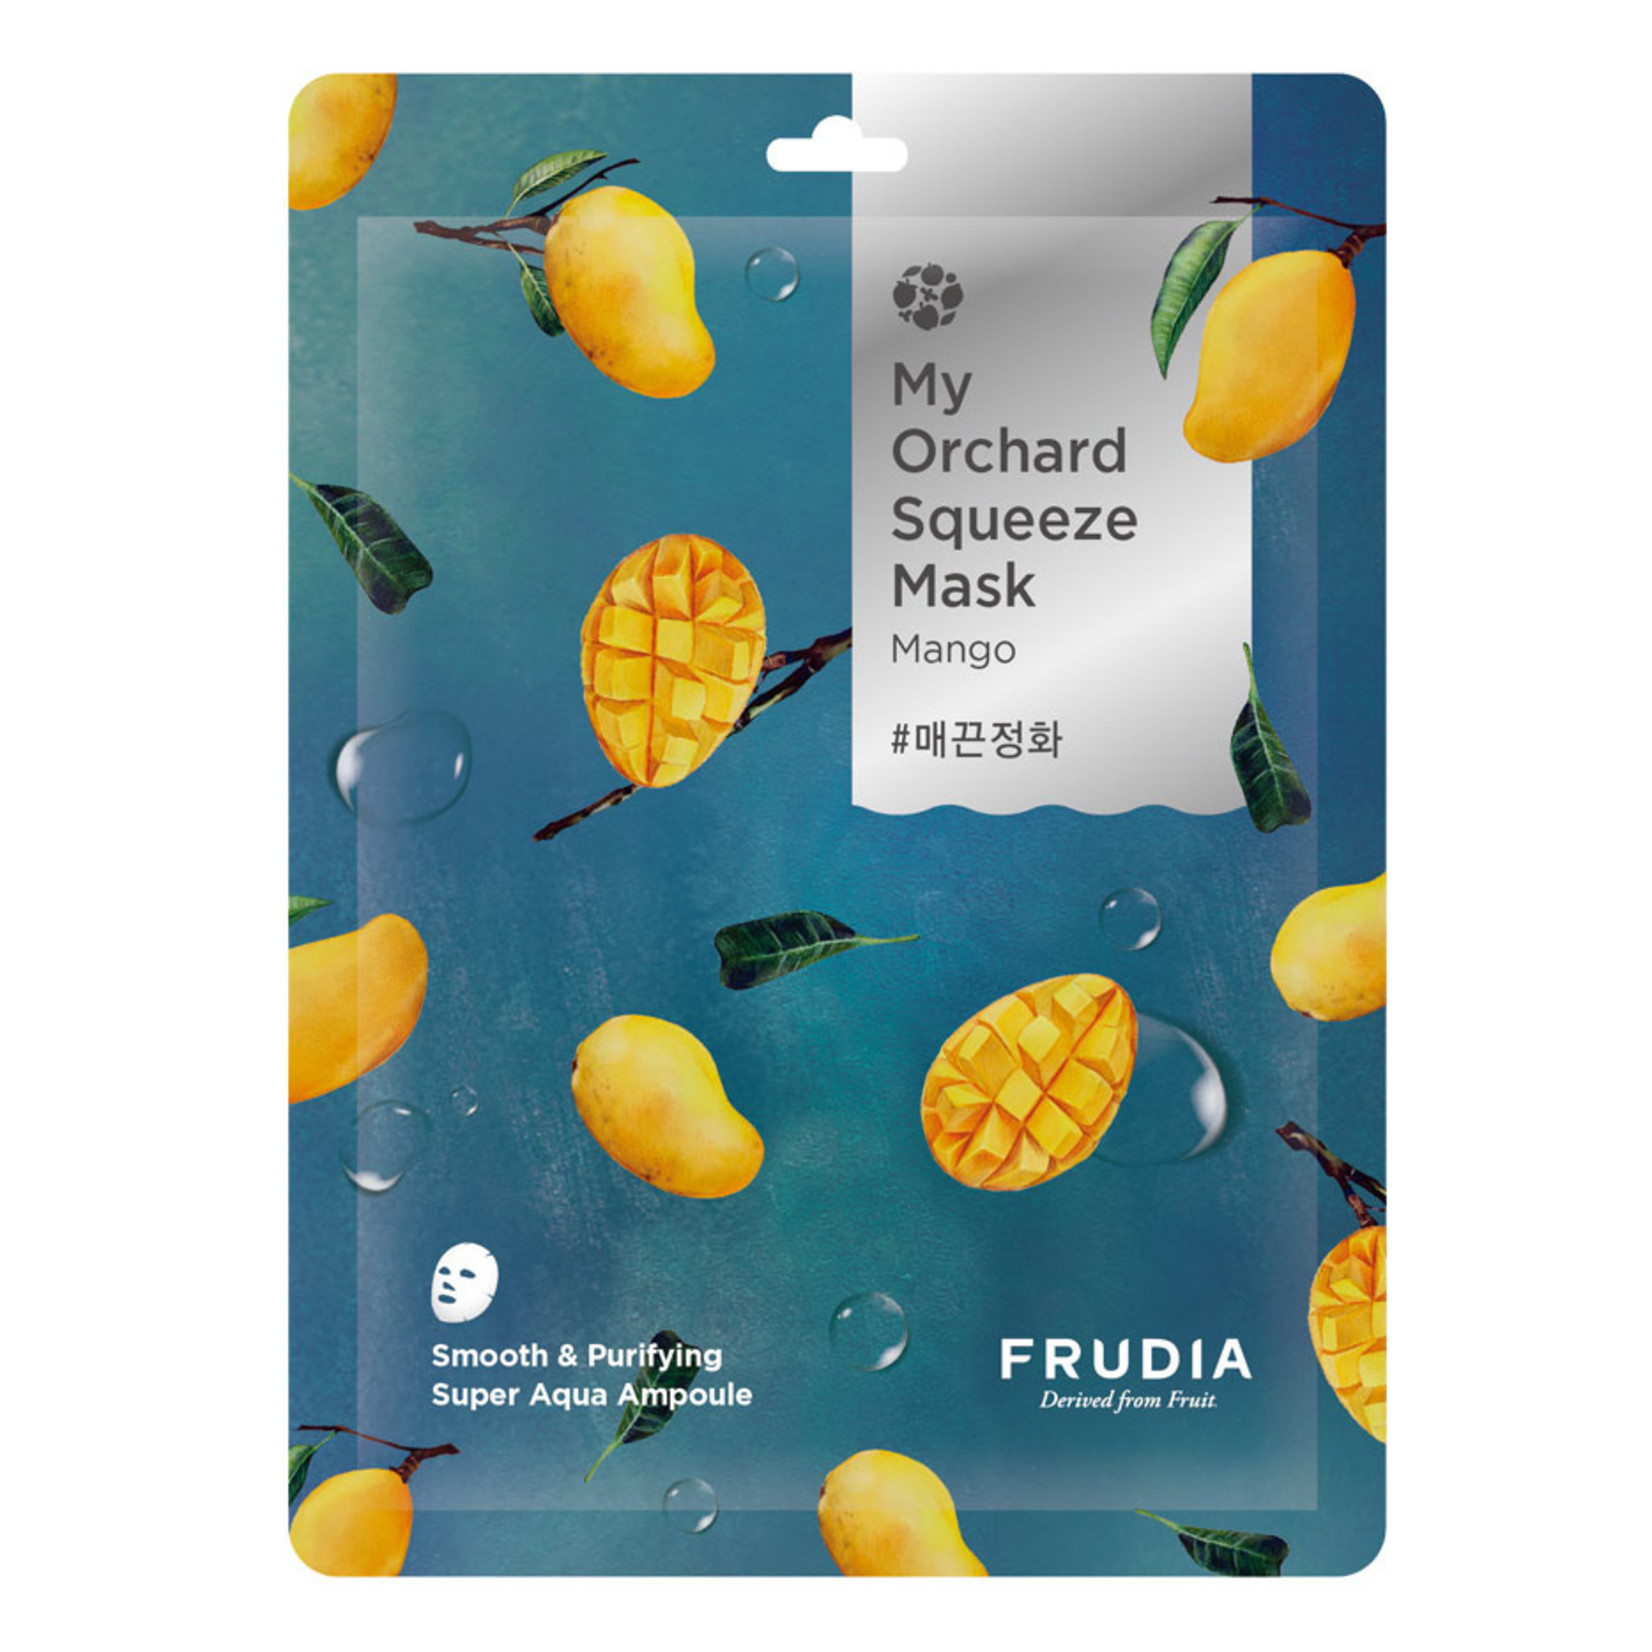 Frudia My Orchard Squeeze Mask Mango 10pcs